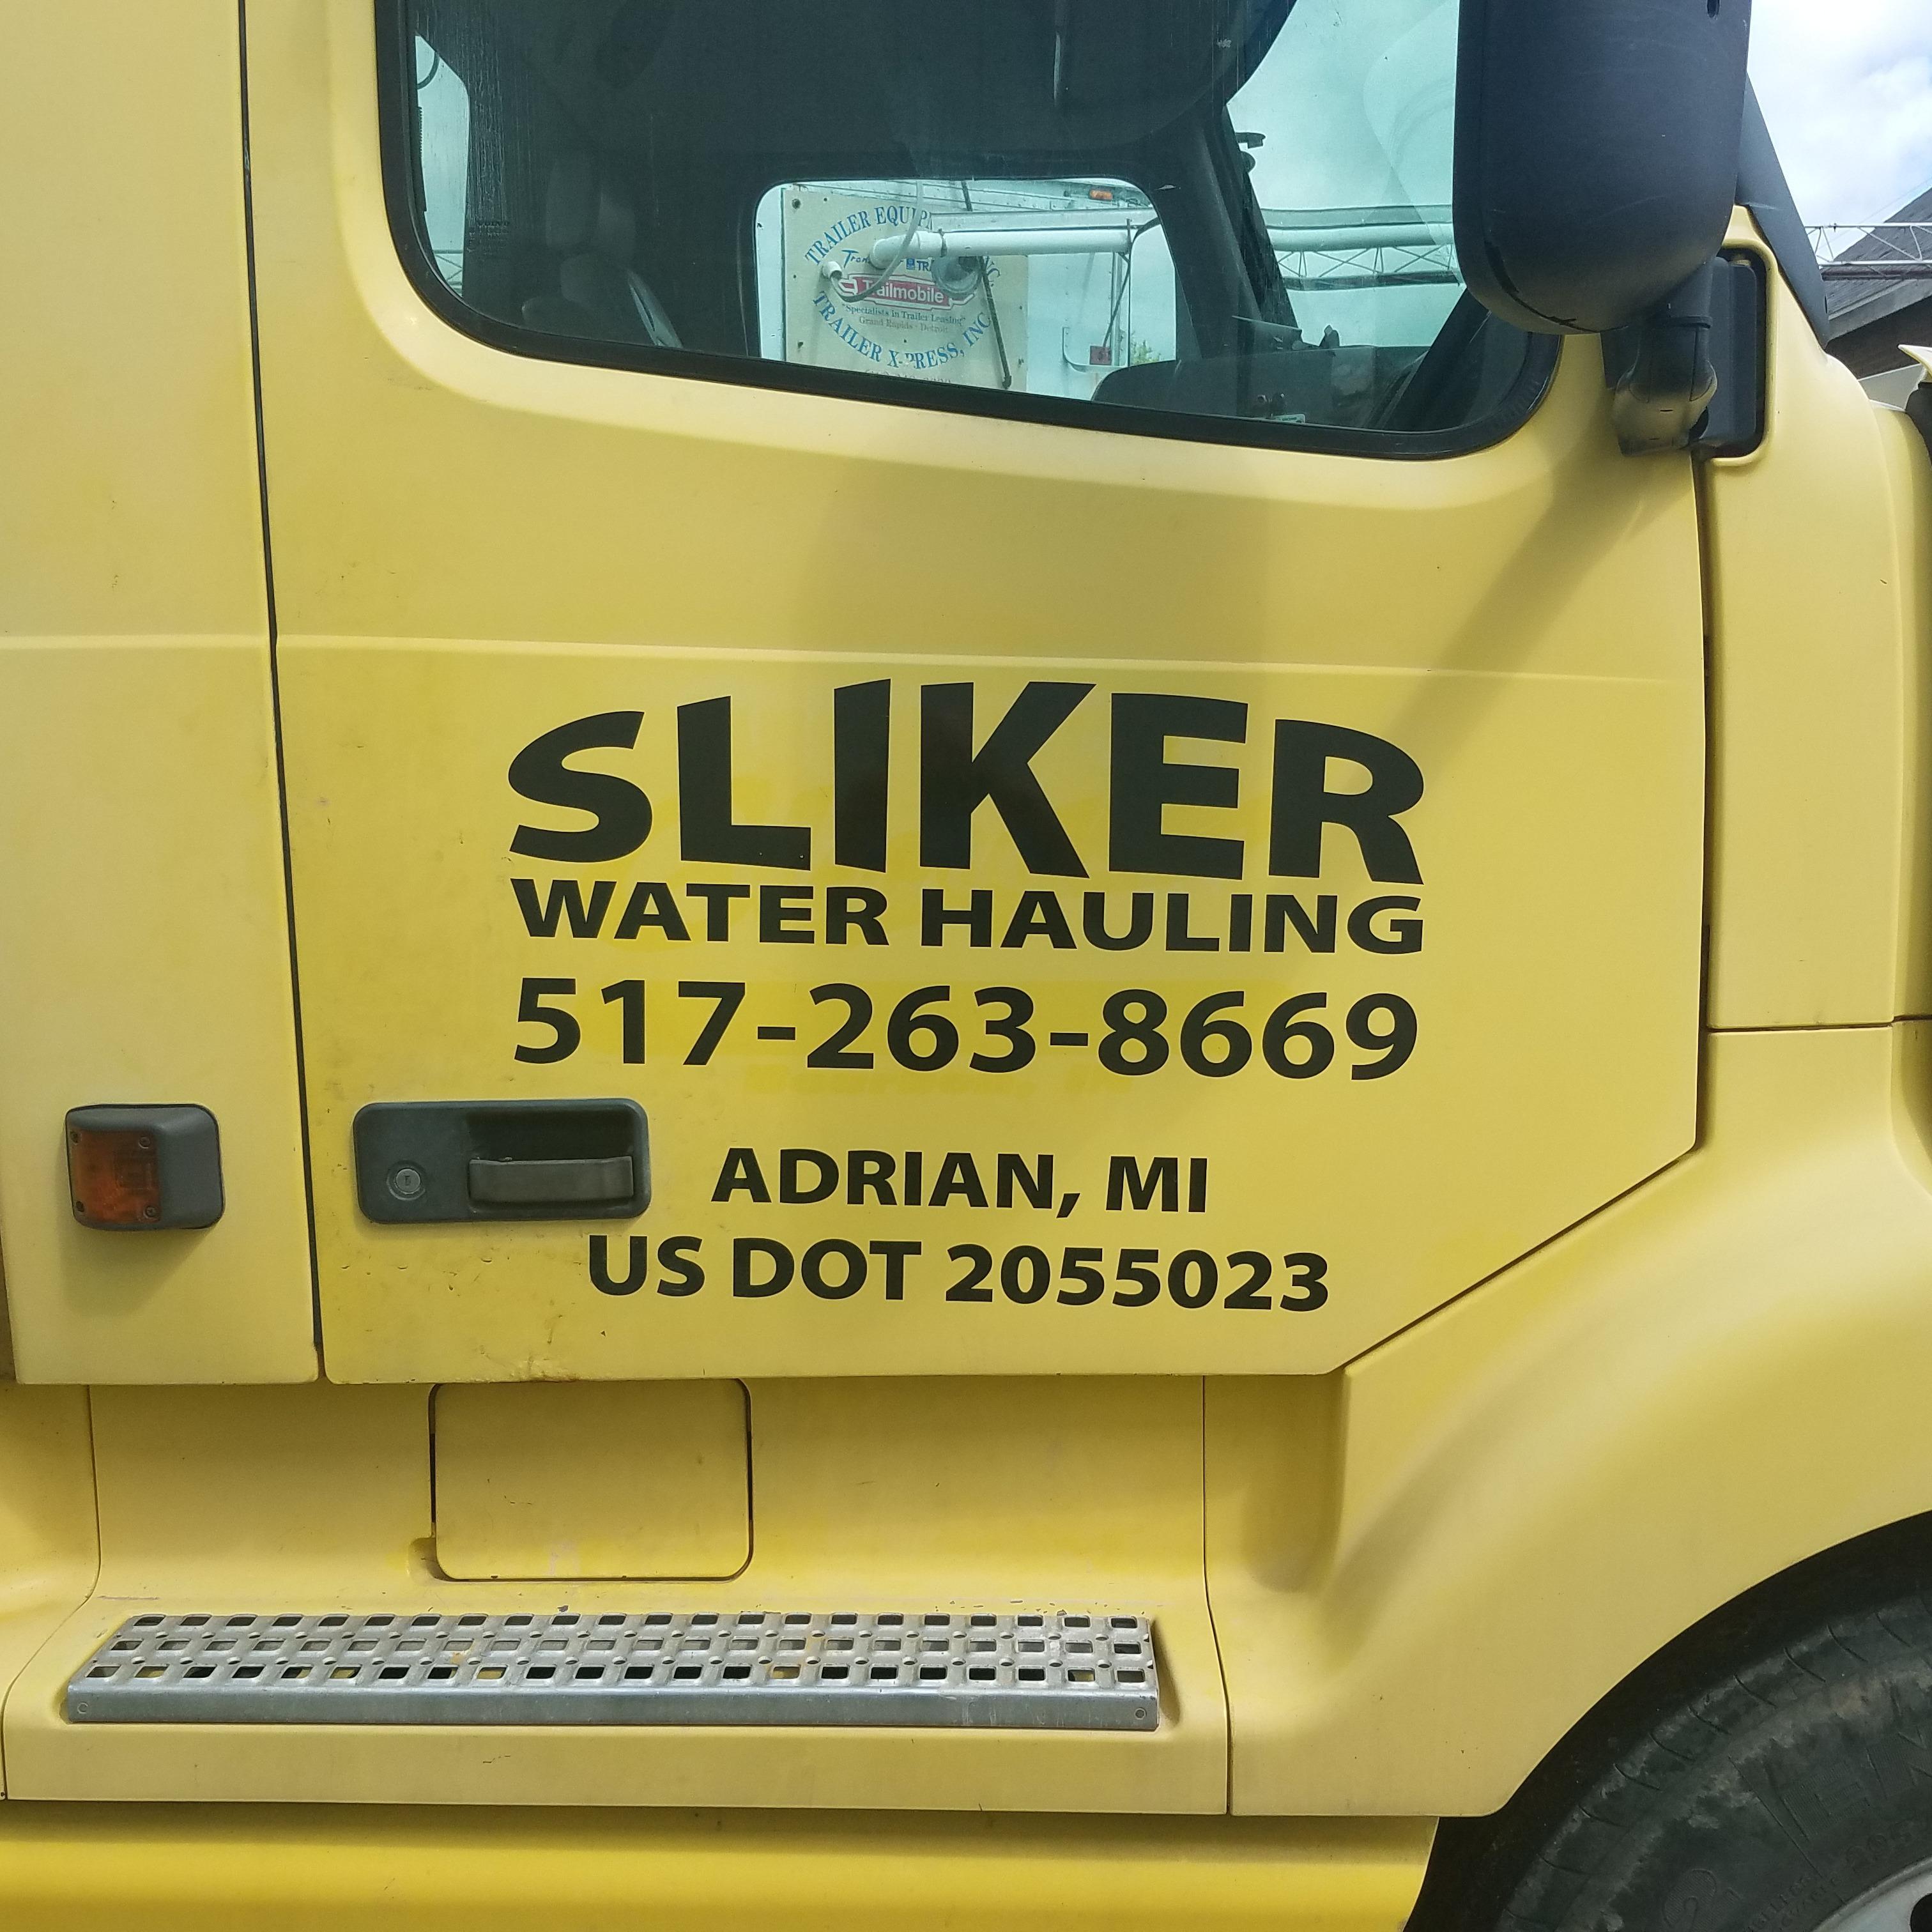 Sliker Water Hauling